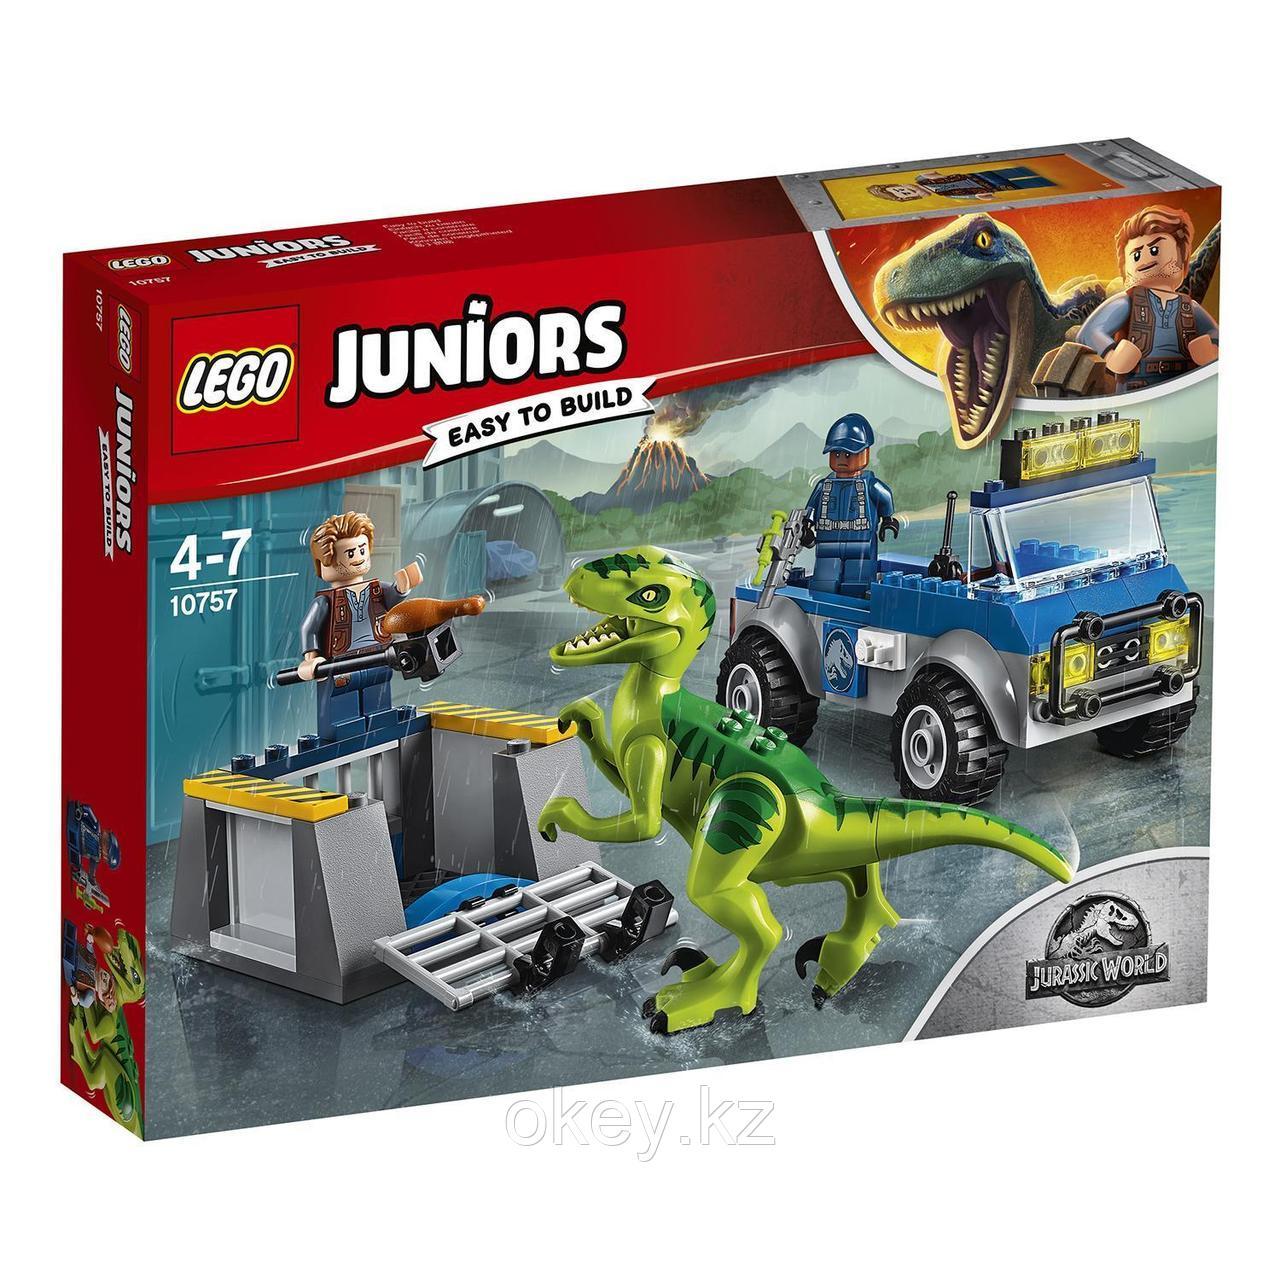 LEGO Juniors: Jurassic World — Грузовик спасателей для перевозки раптора 10757